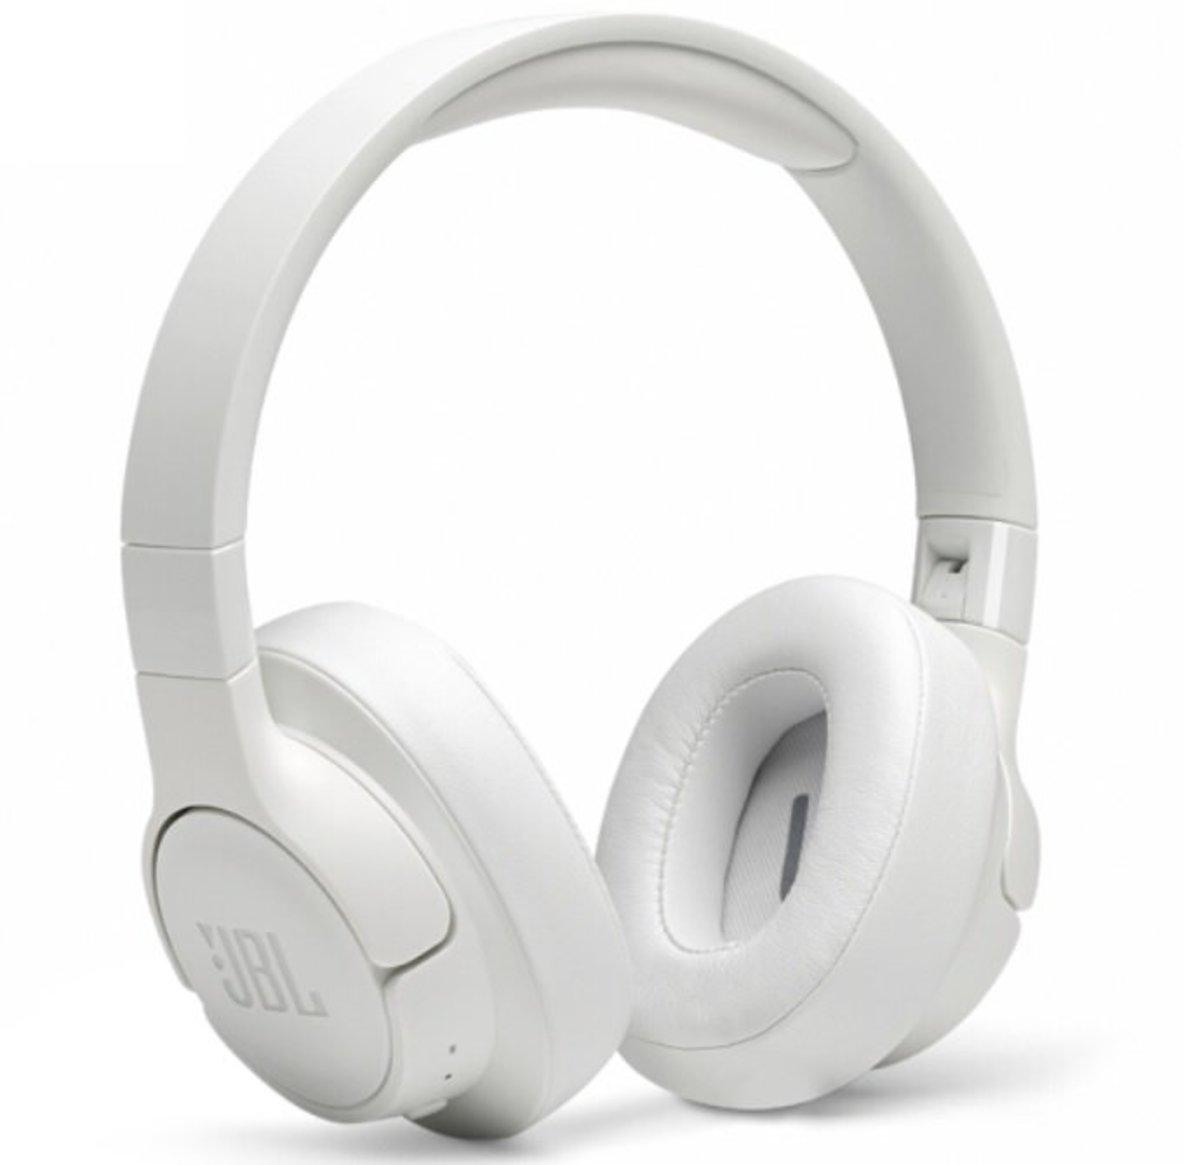 T700BT Wireless on-ear headphones 便攜型藍牙耳罩式耳機 (WHITE)